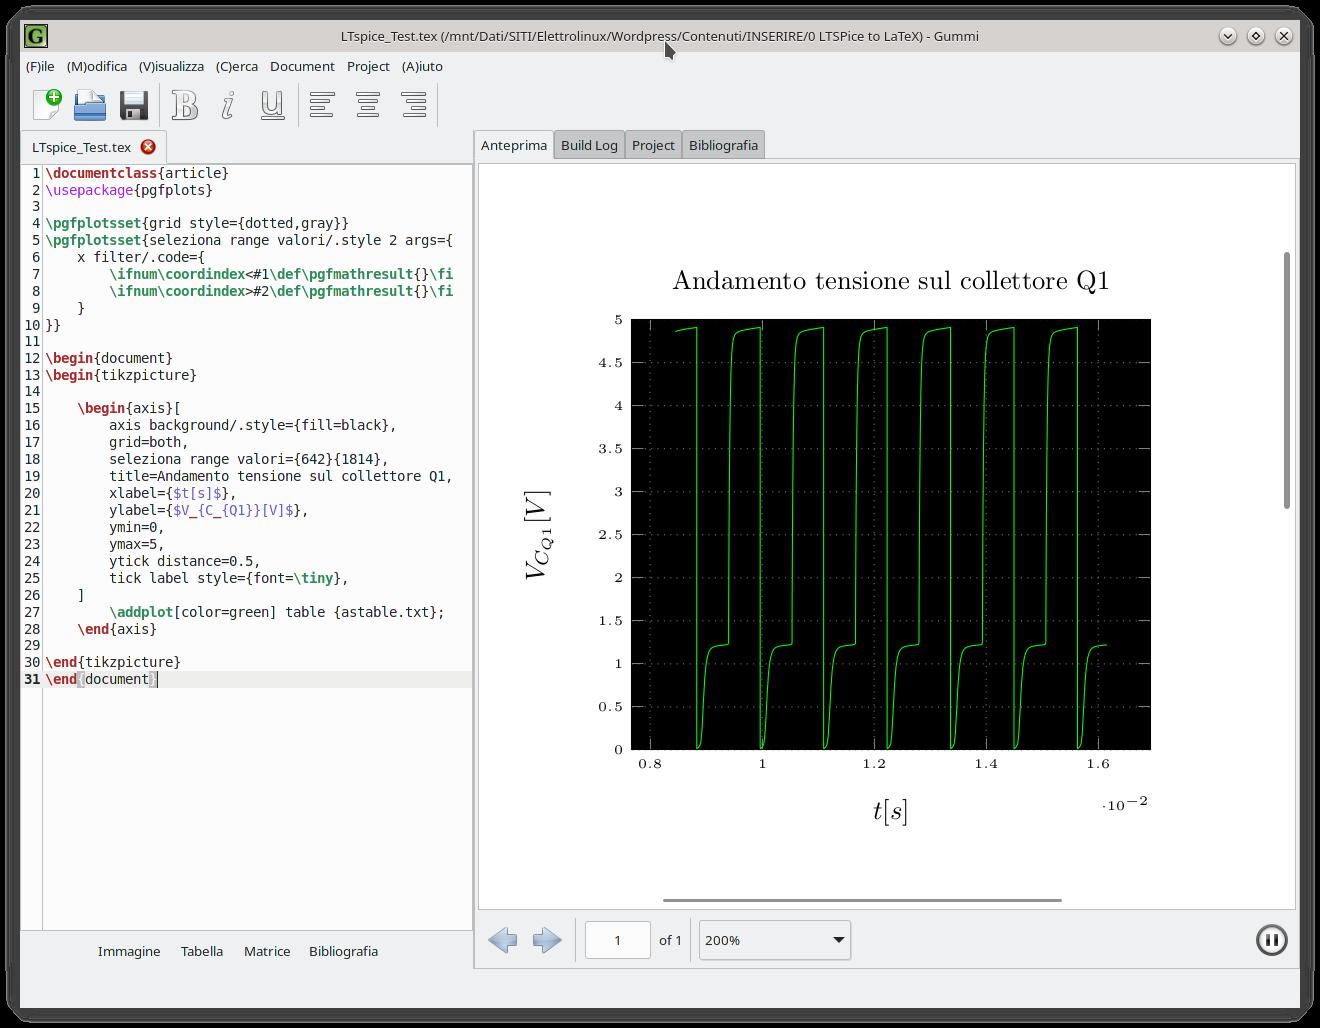 Simulazioni LTspice convertite in documenti LaTeX